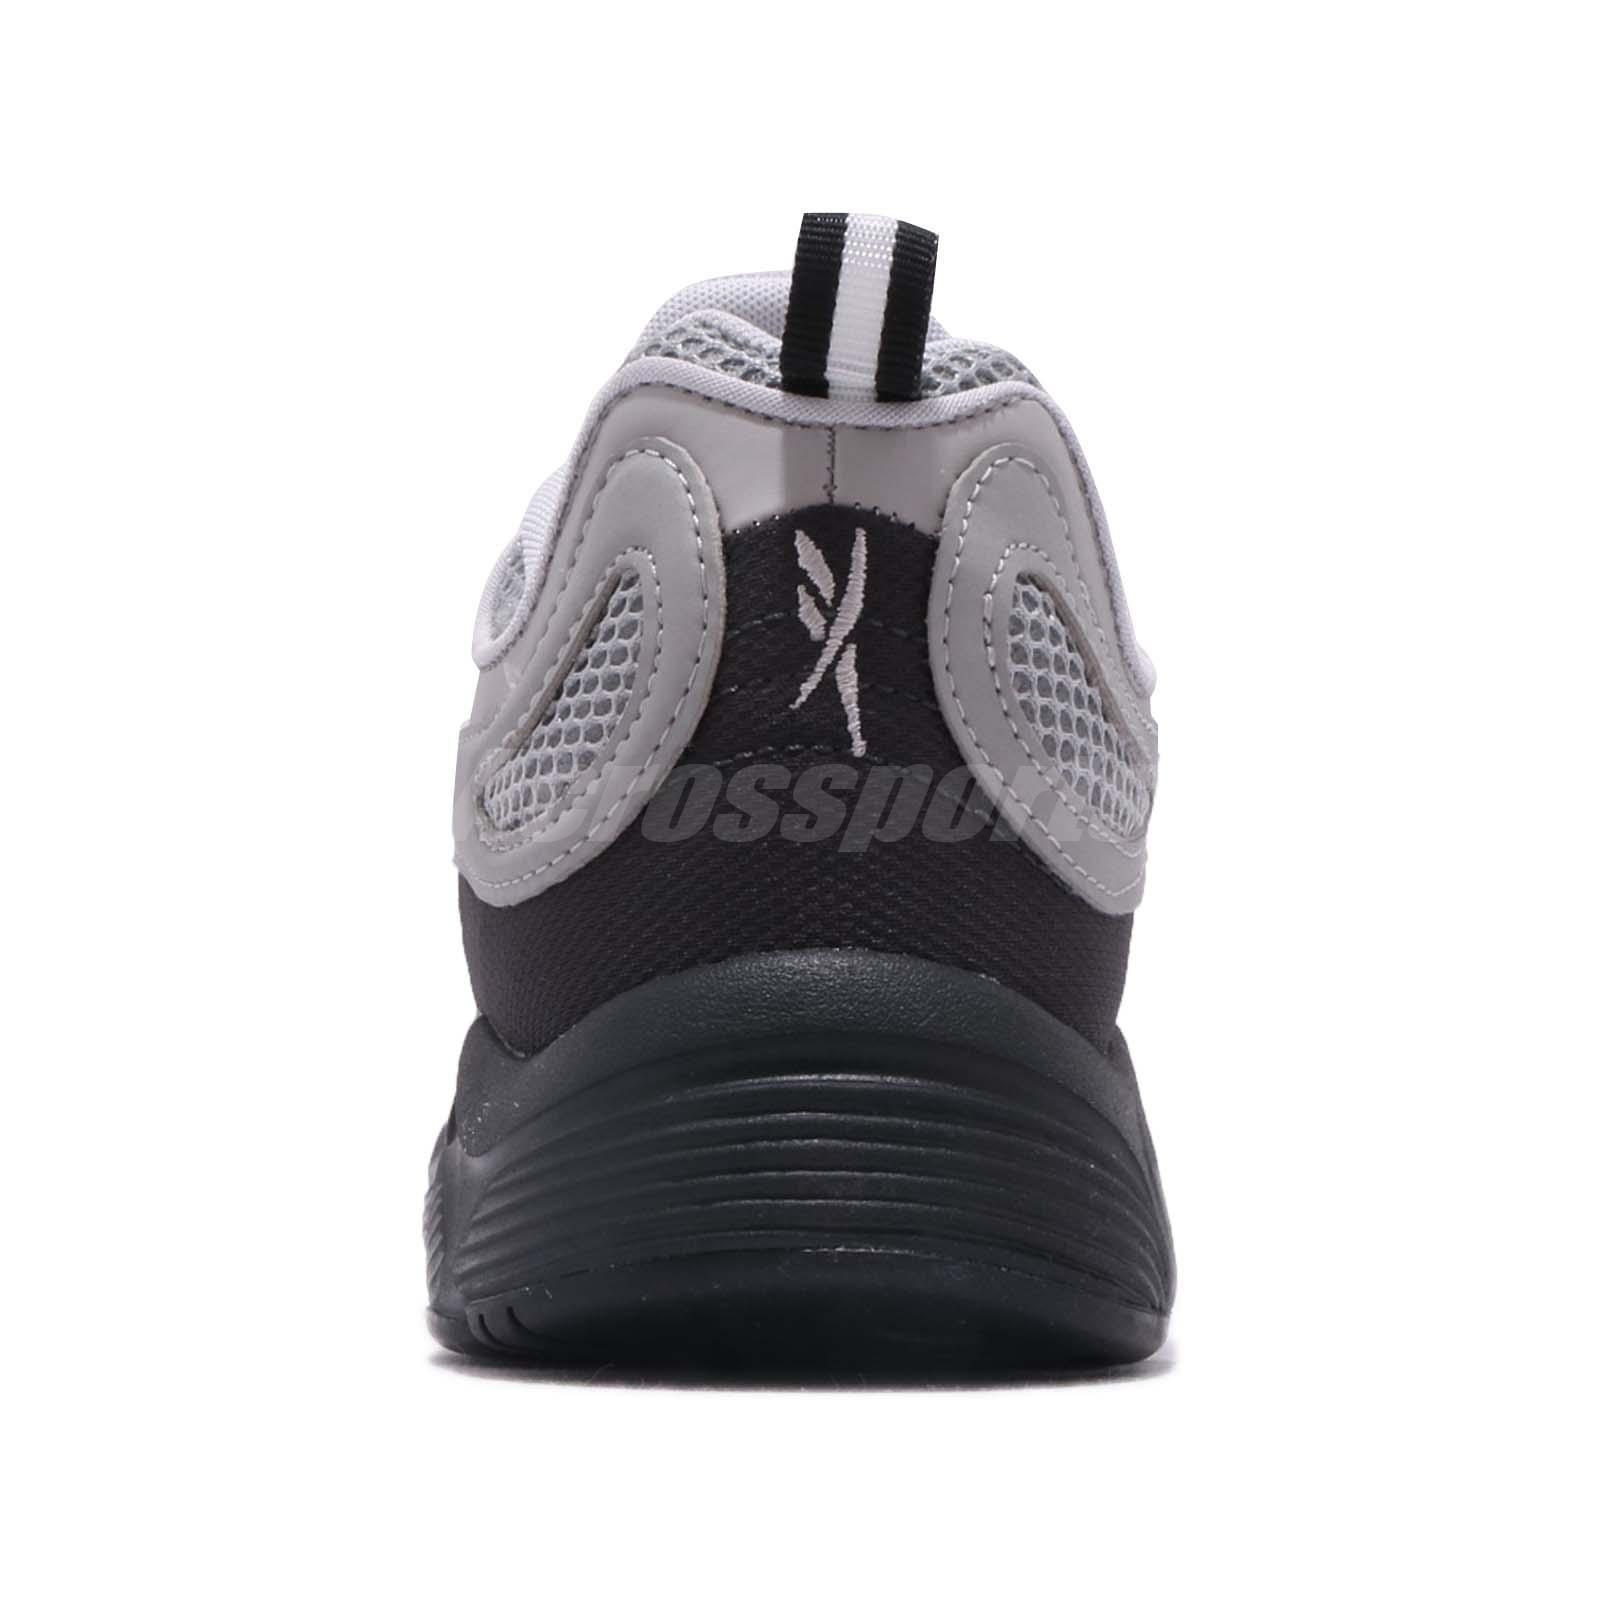 1d9b8b94d29 Reebok Daytona DMX Black Carbon Grey Red Men Running Daddy Shoes ...